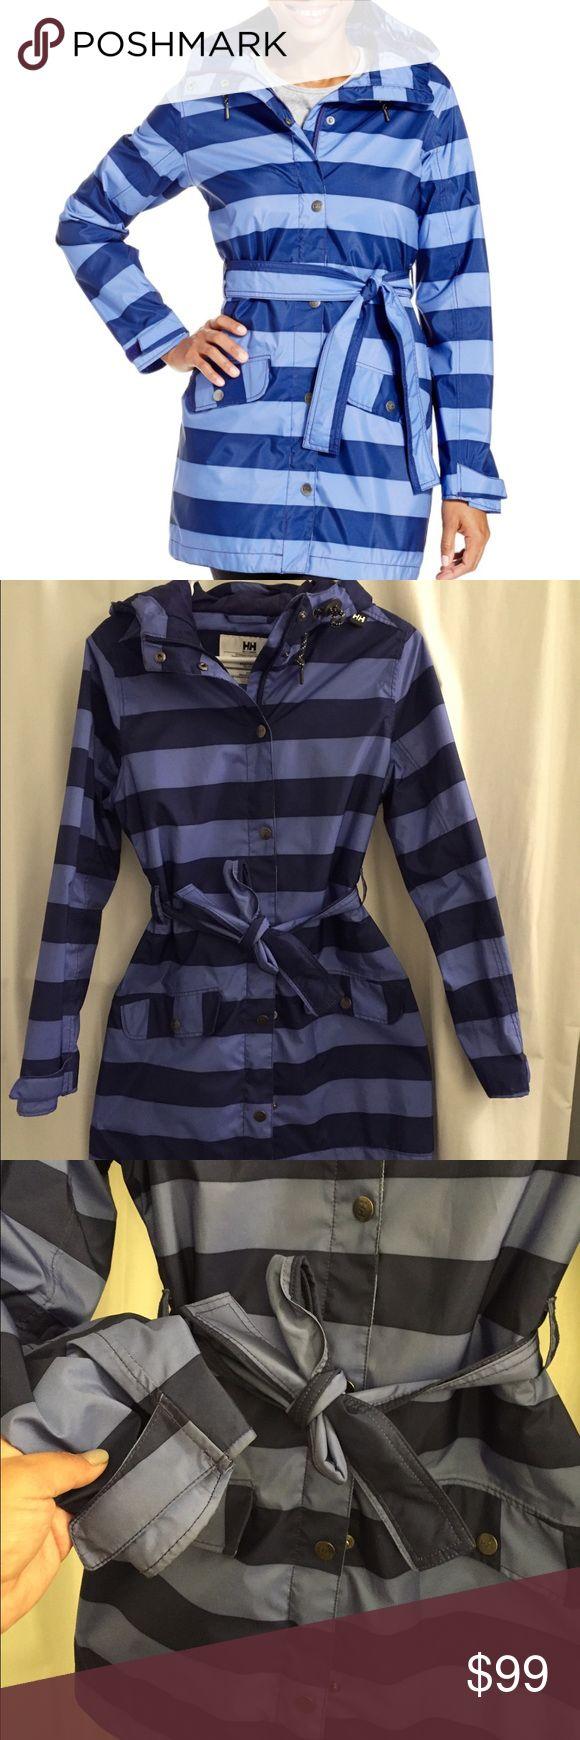 Helly Hansen rain jacket Helly Hansen rain coat. Good condition and purchased from Macy's Helly Hansen Jackets & Coats